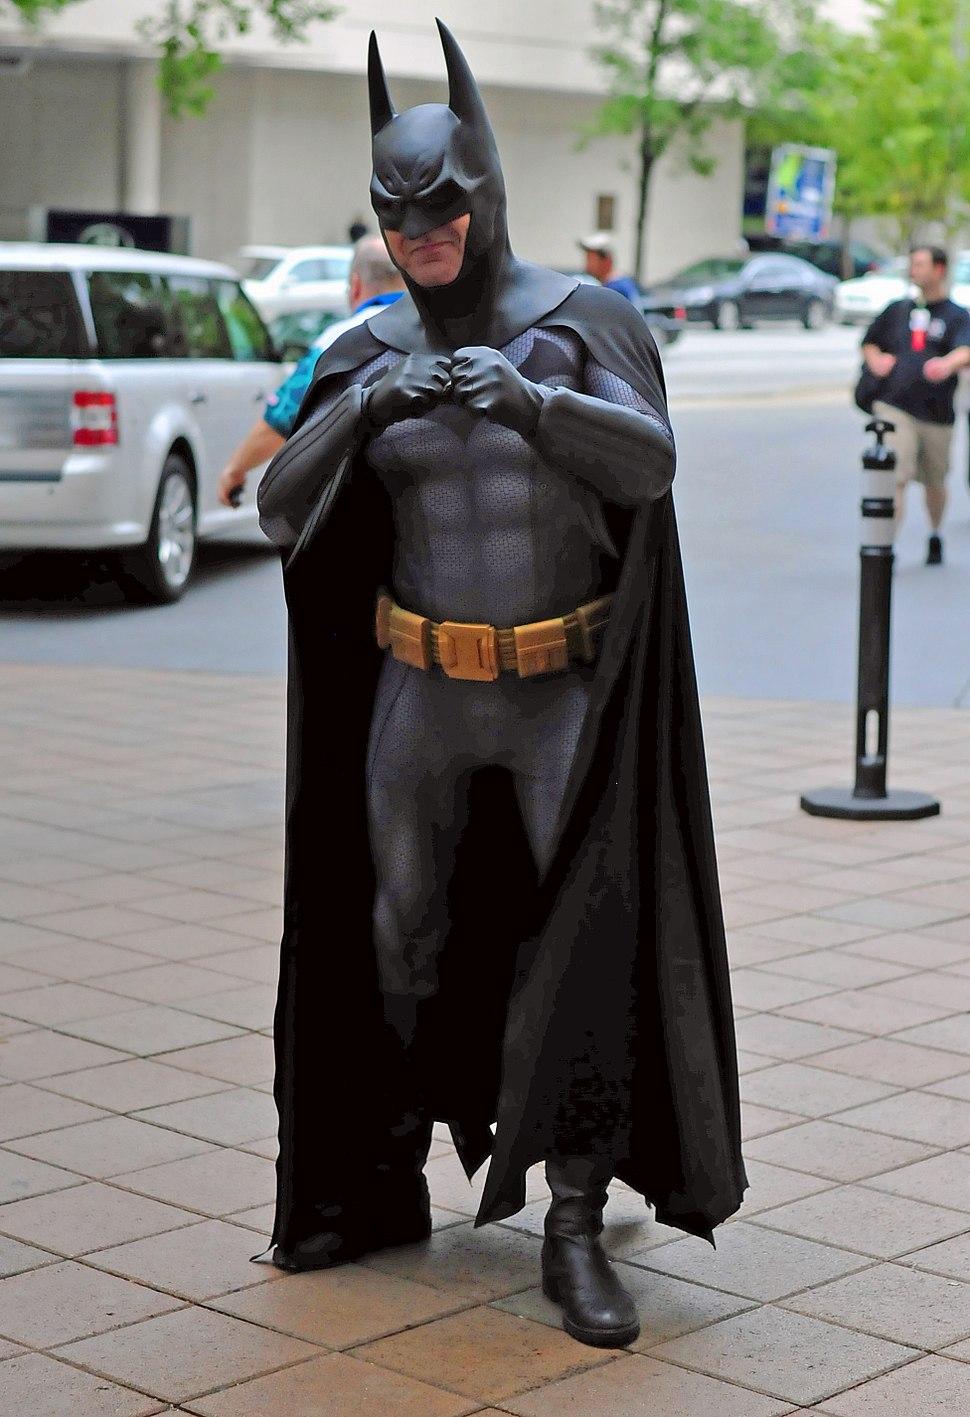 Batman Cosplayer at DragonCon